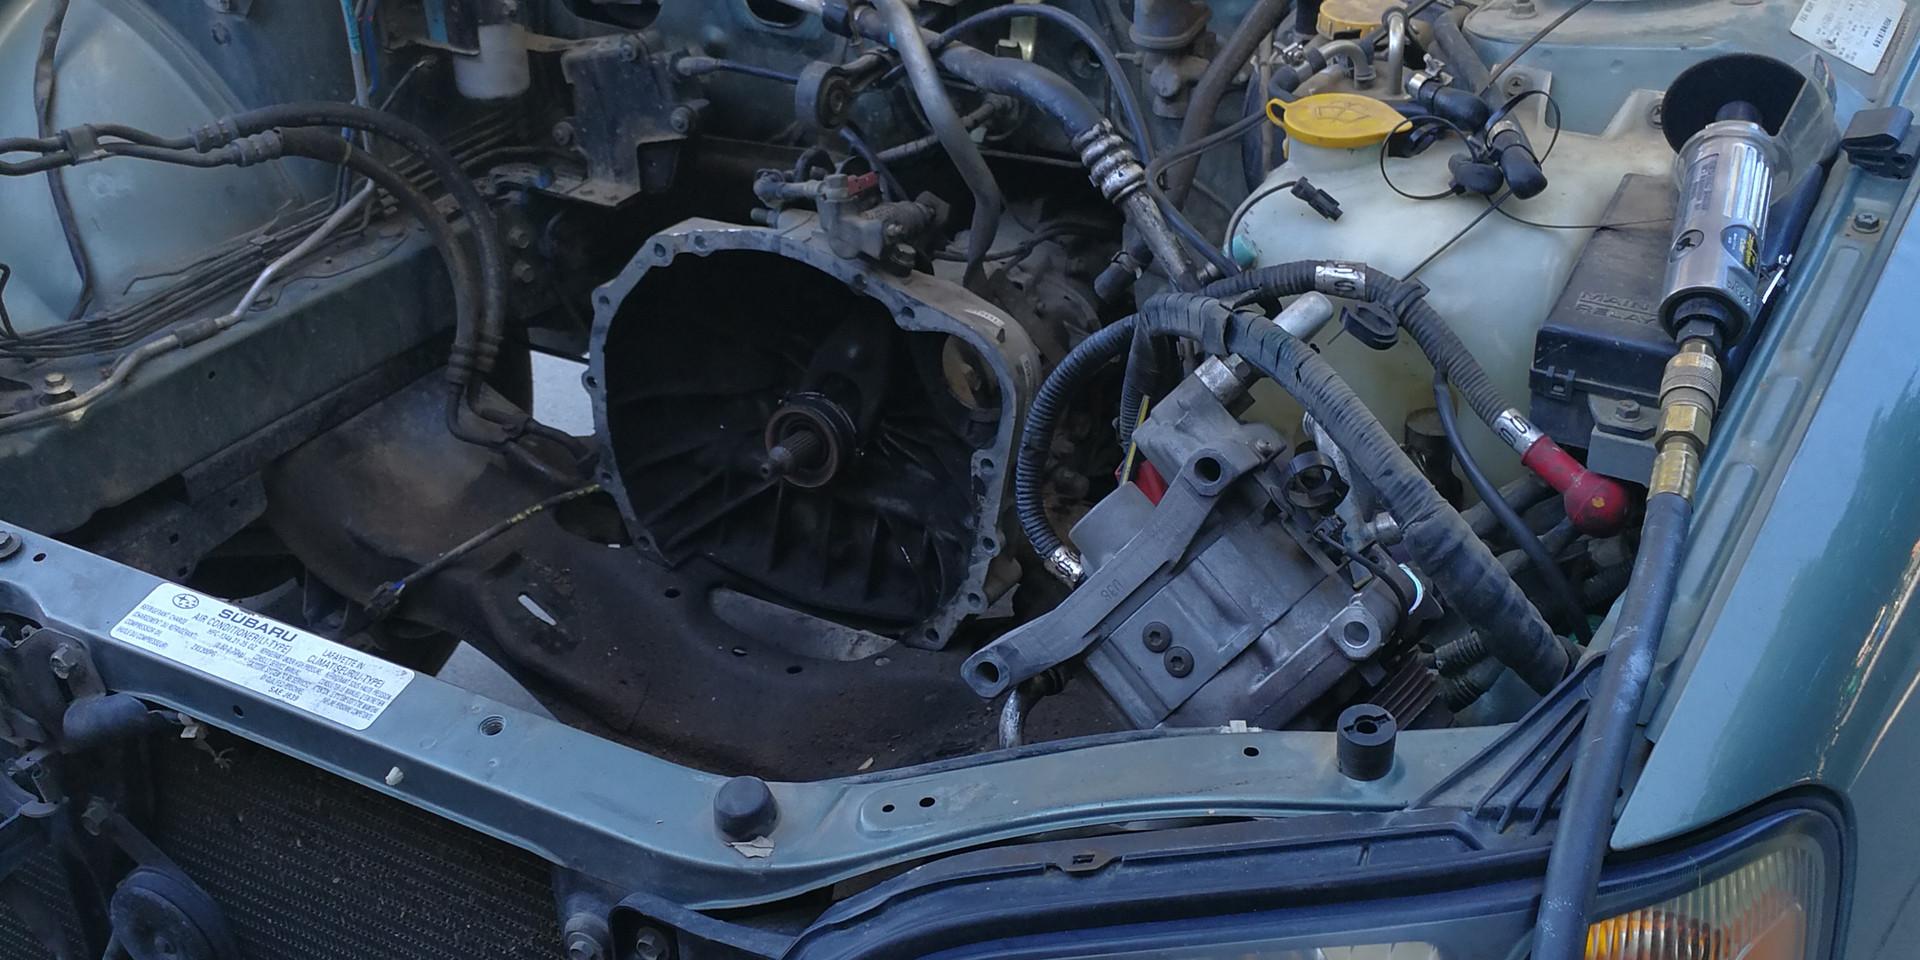 Empty Subaru engine bay.